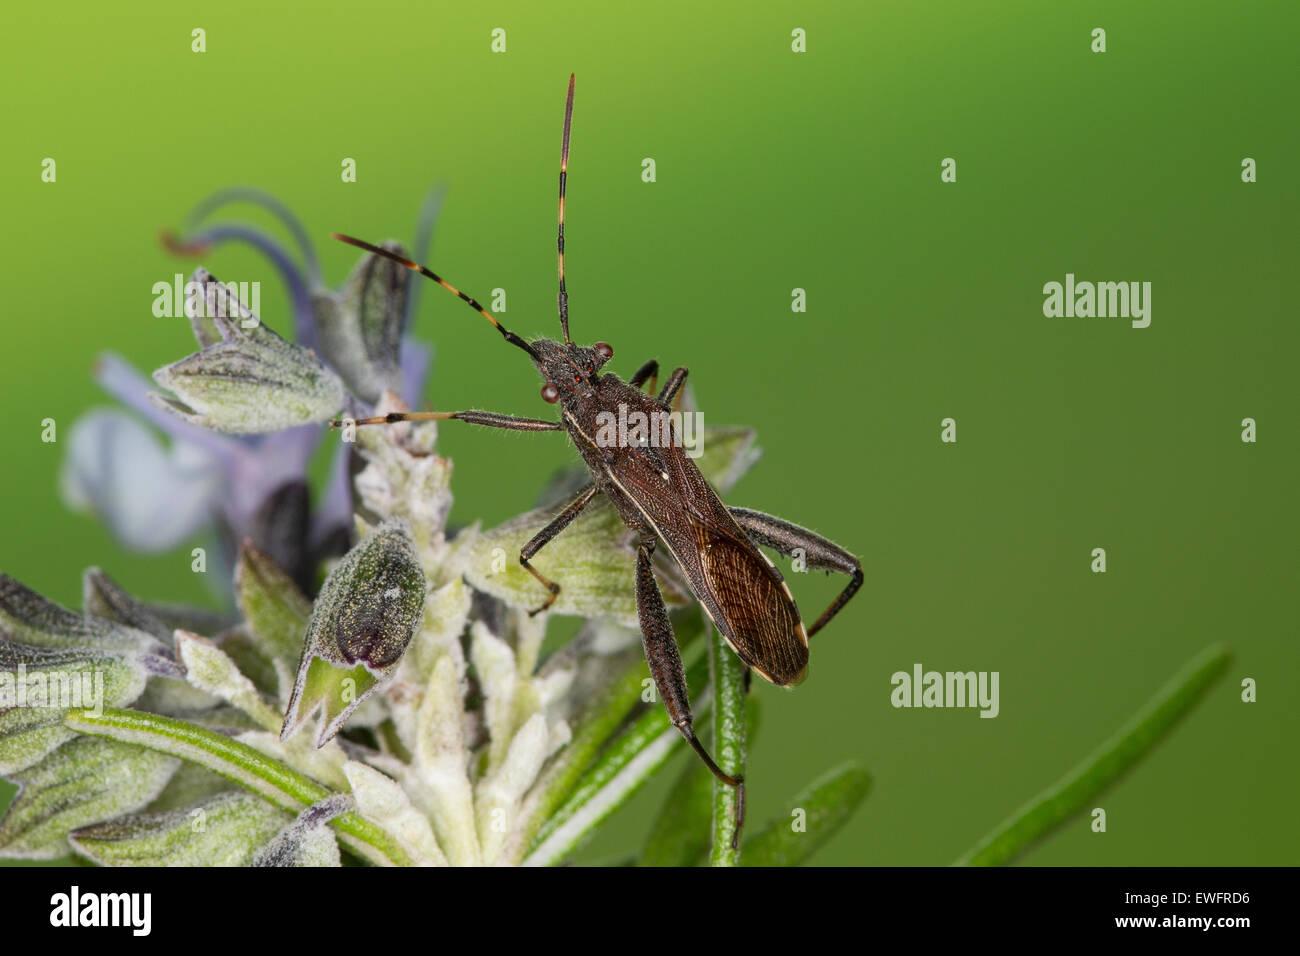 Broad-headed Bug, Sichelbein, Sichelbein-Wanze, Krummfühlerwanze, Krummfühler-Wanze, Camptopus lateralis - Stock Image